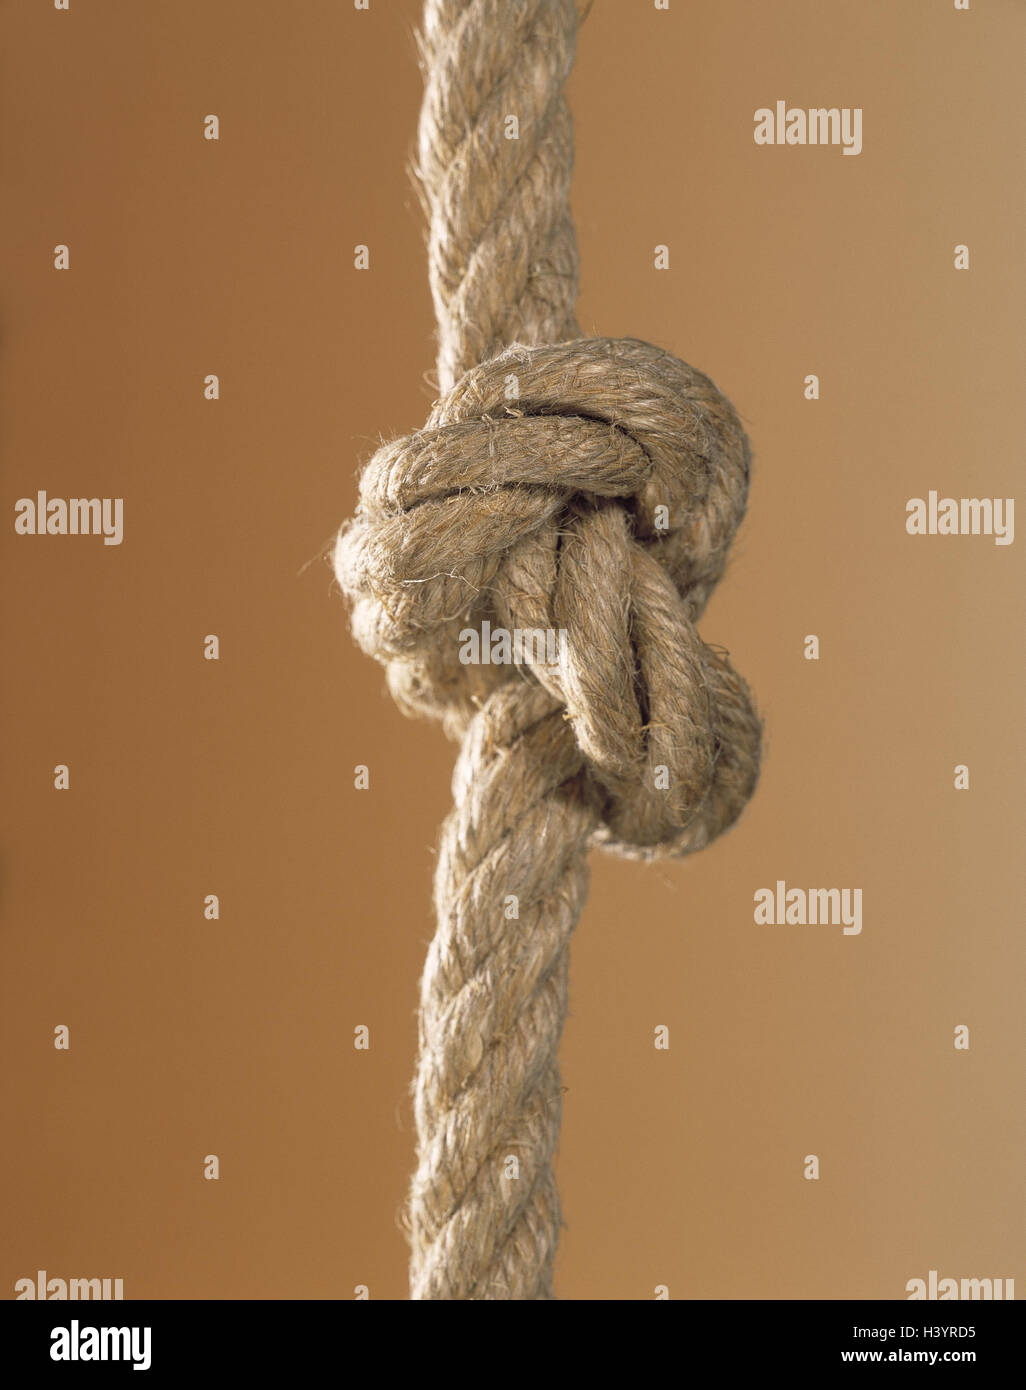 Seil, Knoten, Seil, Symbol, Verknüpfung, Verbindung, Union ...